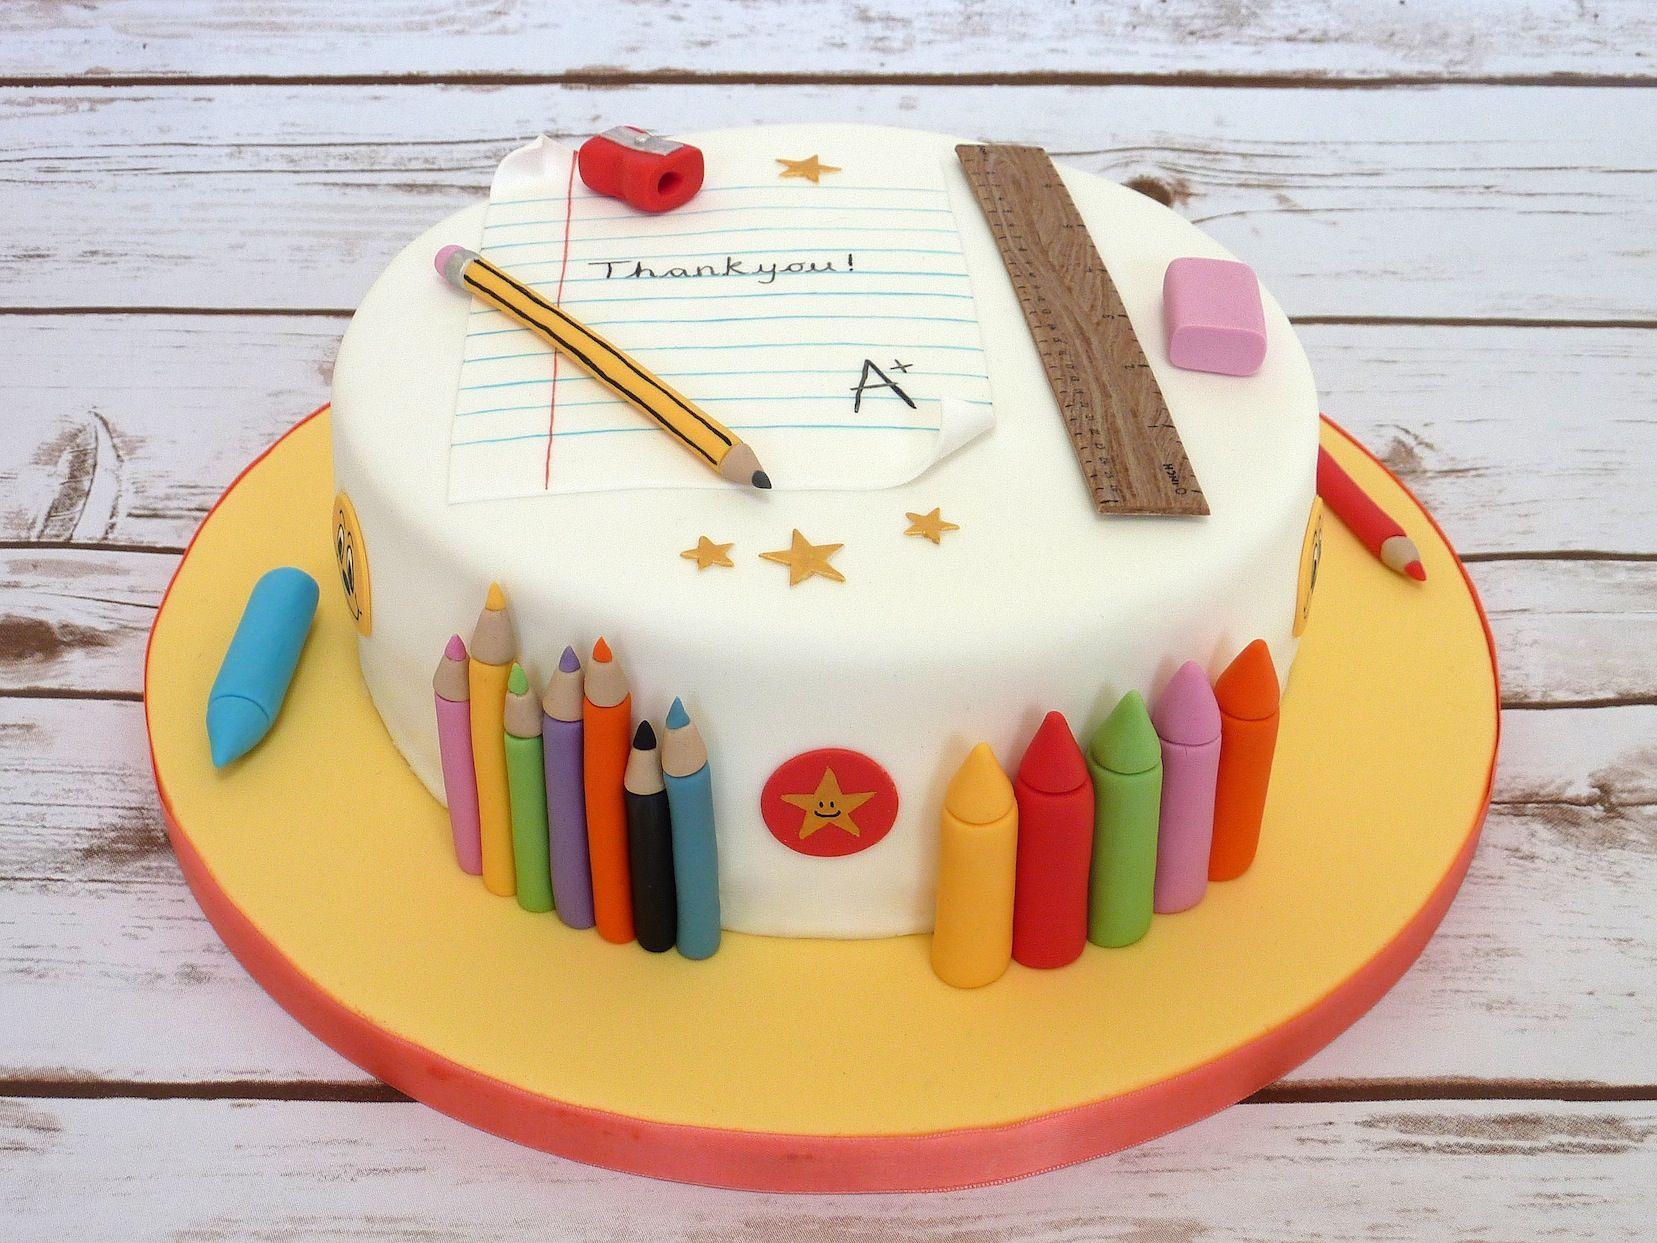 Thank You Cake Decorating Ideas